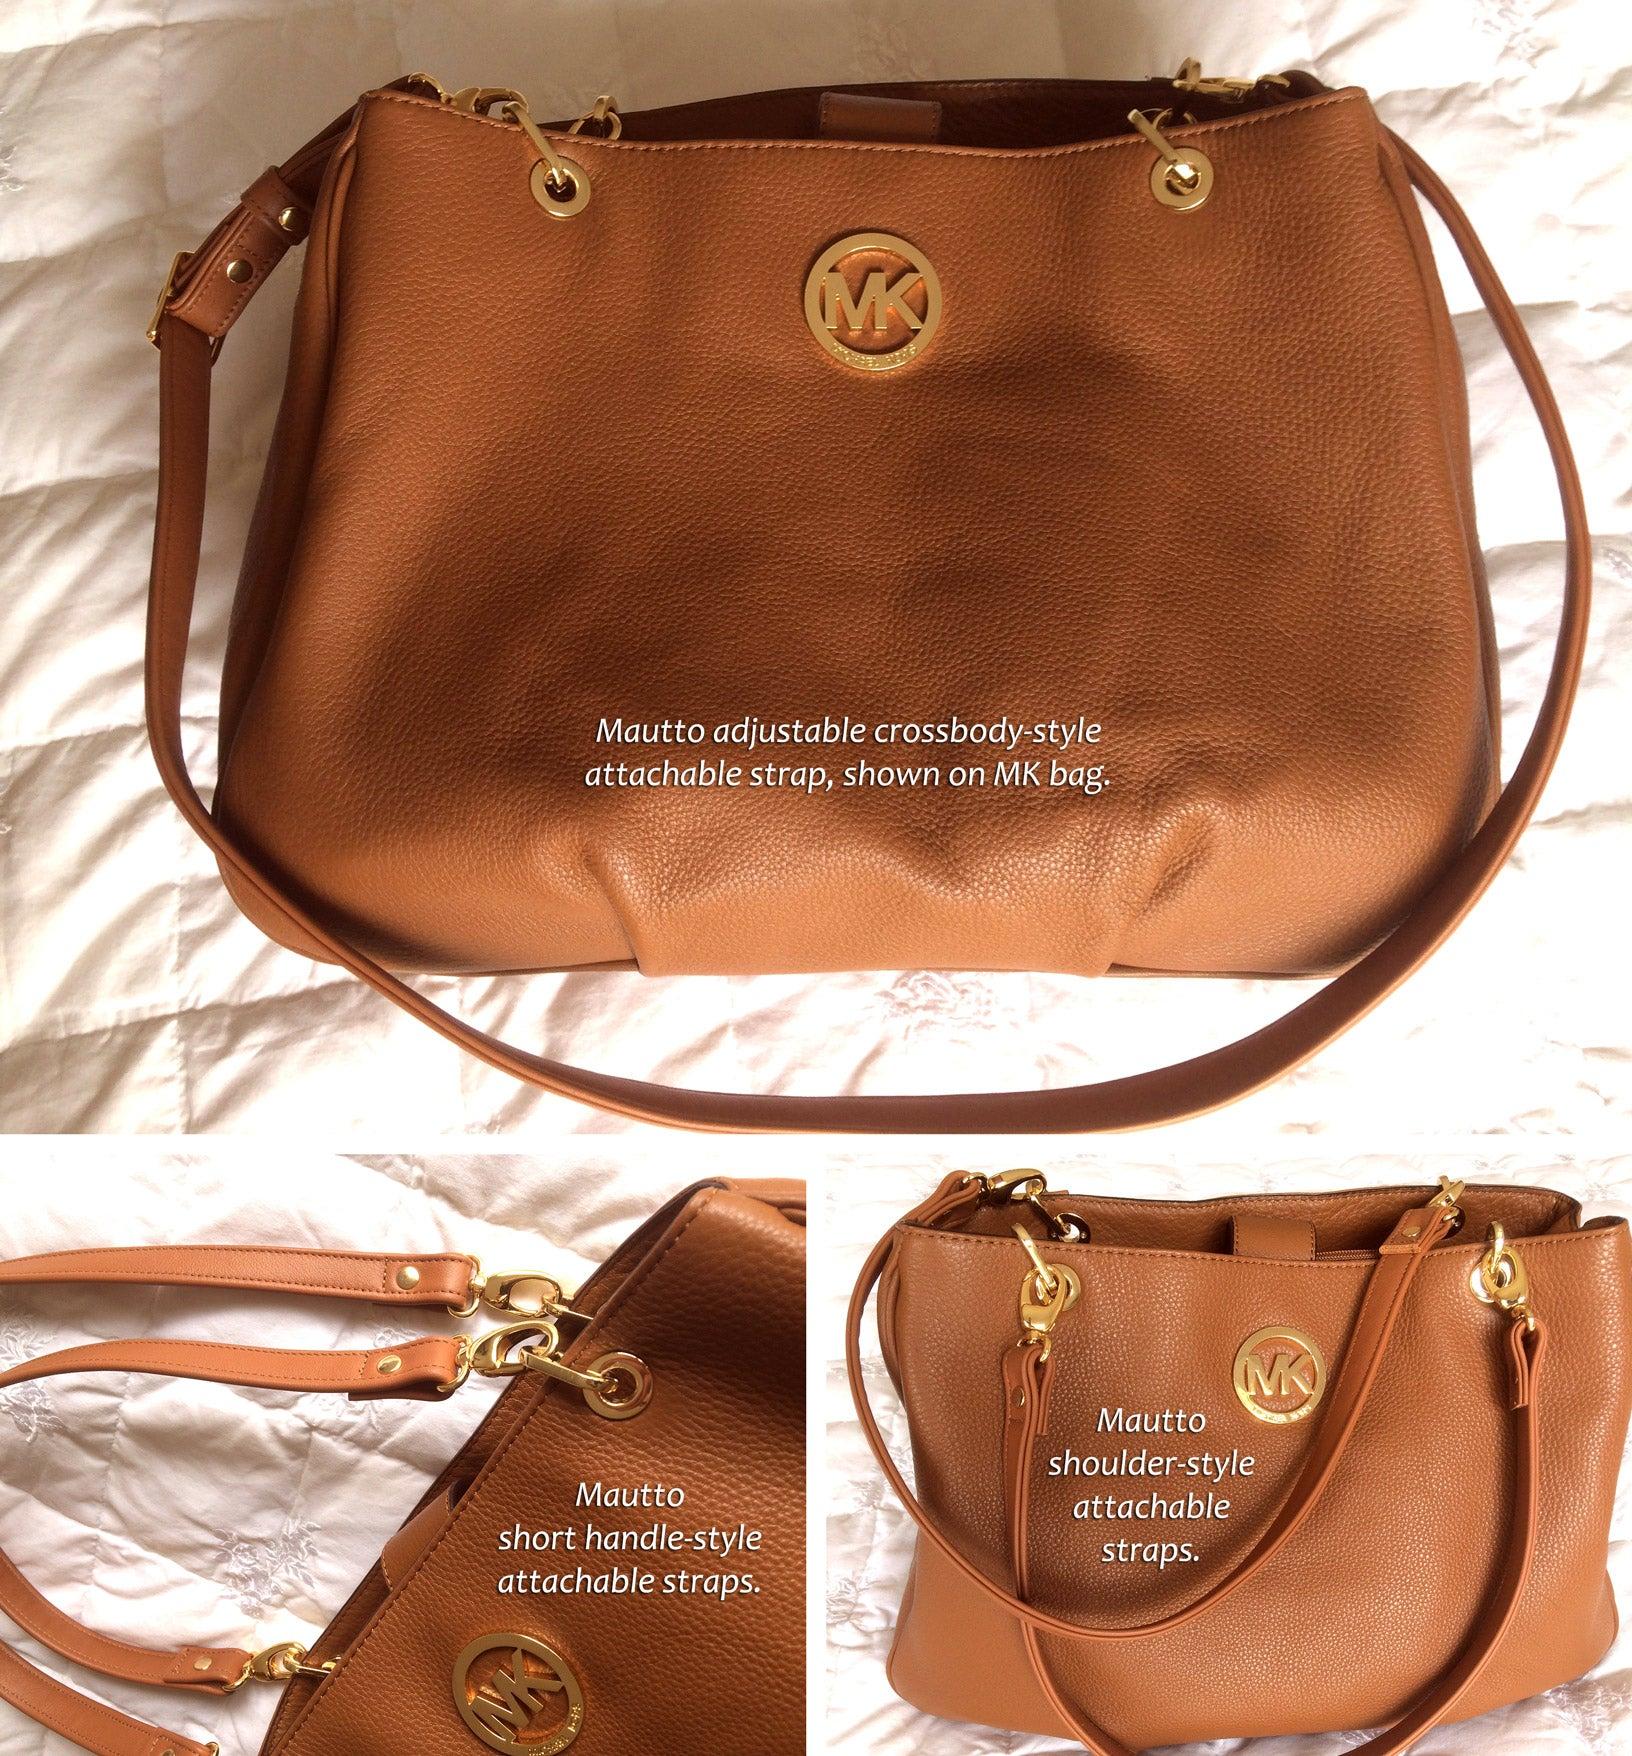 Michael Kors Handbag Strap Replacement Uk Handbags Coupons Printable